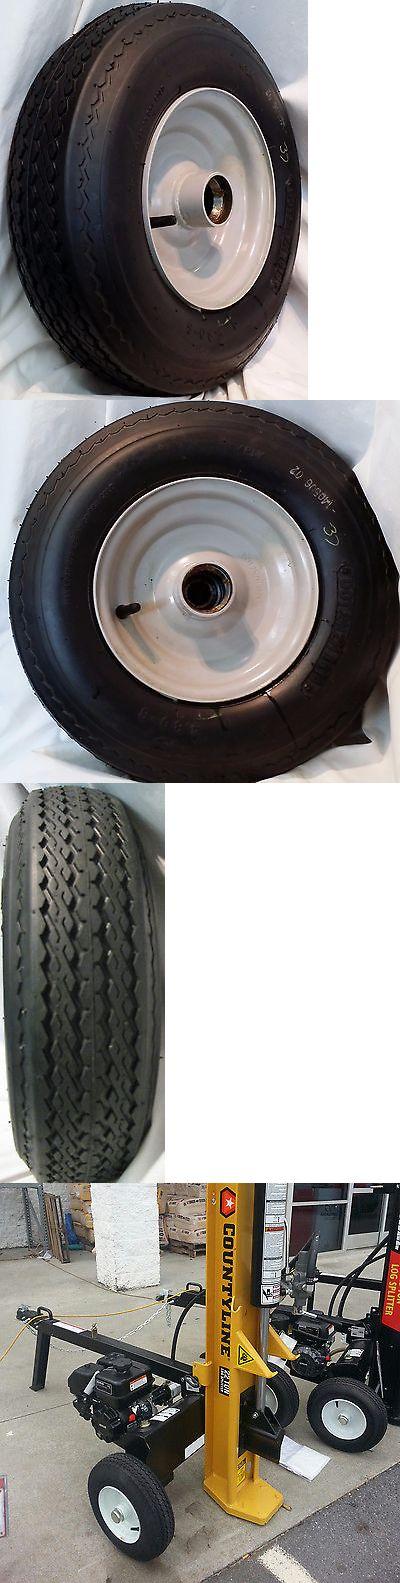 Log Splitters 39019: 1) 4.80-8 4.80X8 480X8 480-8 Oe Log Splitter Tire Rim Wheel Huskee Airens Blem -> BUY IT NOW ONLY: $44.95 on eBay!